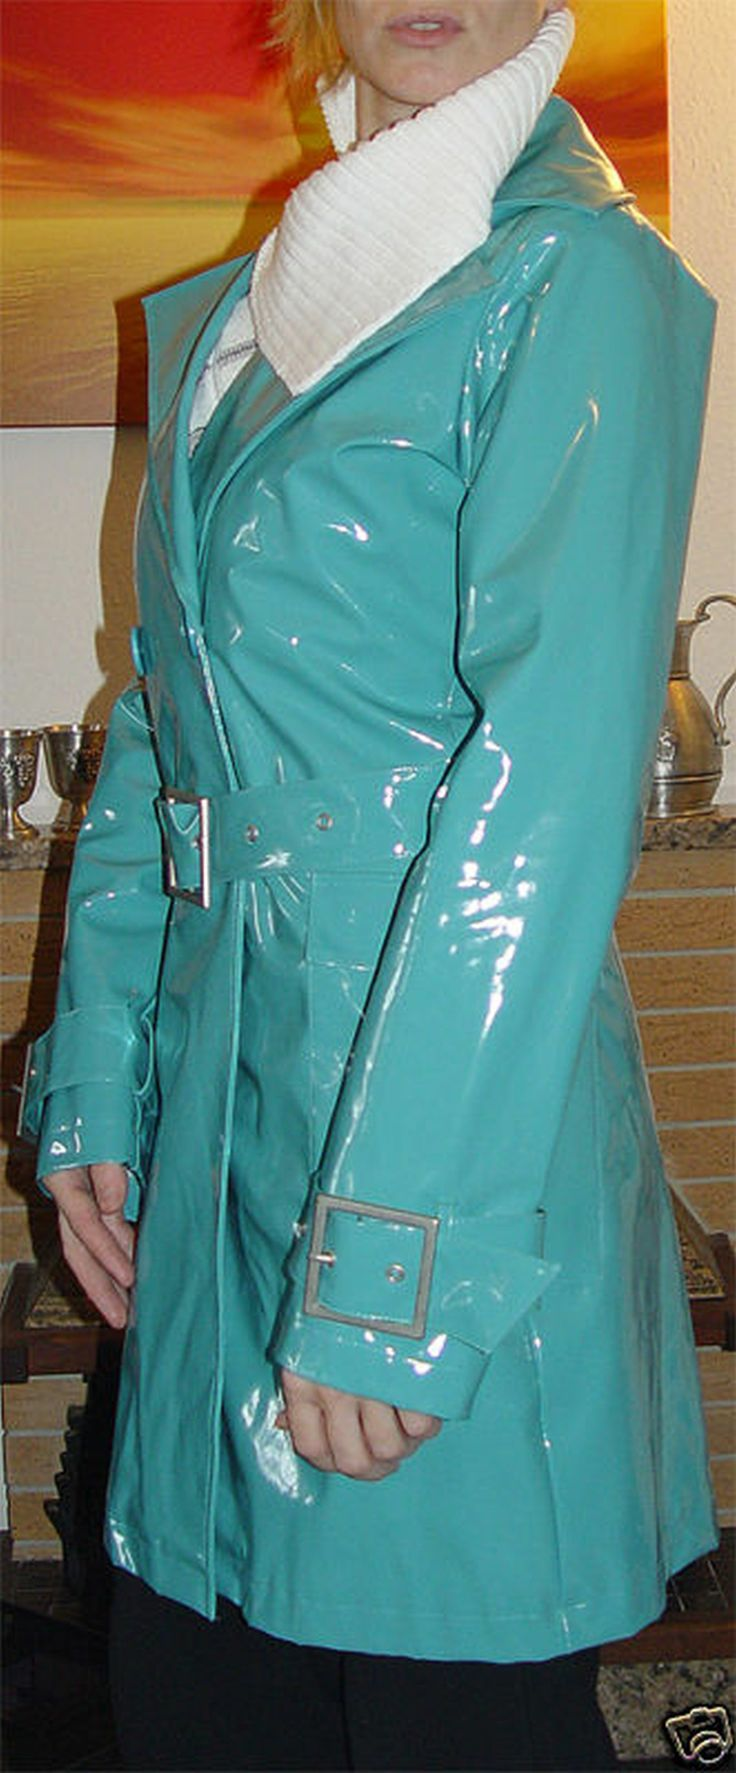 Bigg Pixel Green Raincoat Pinterest